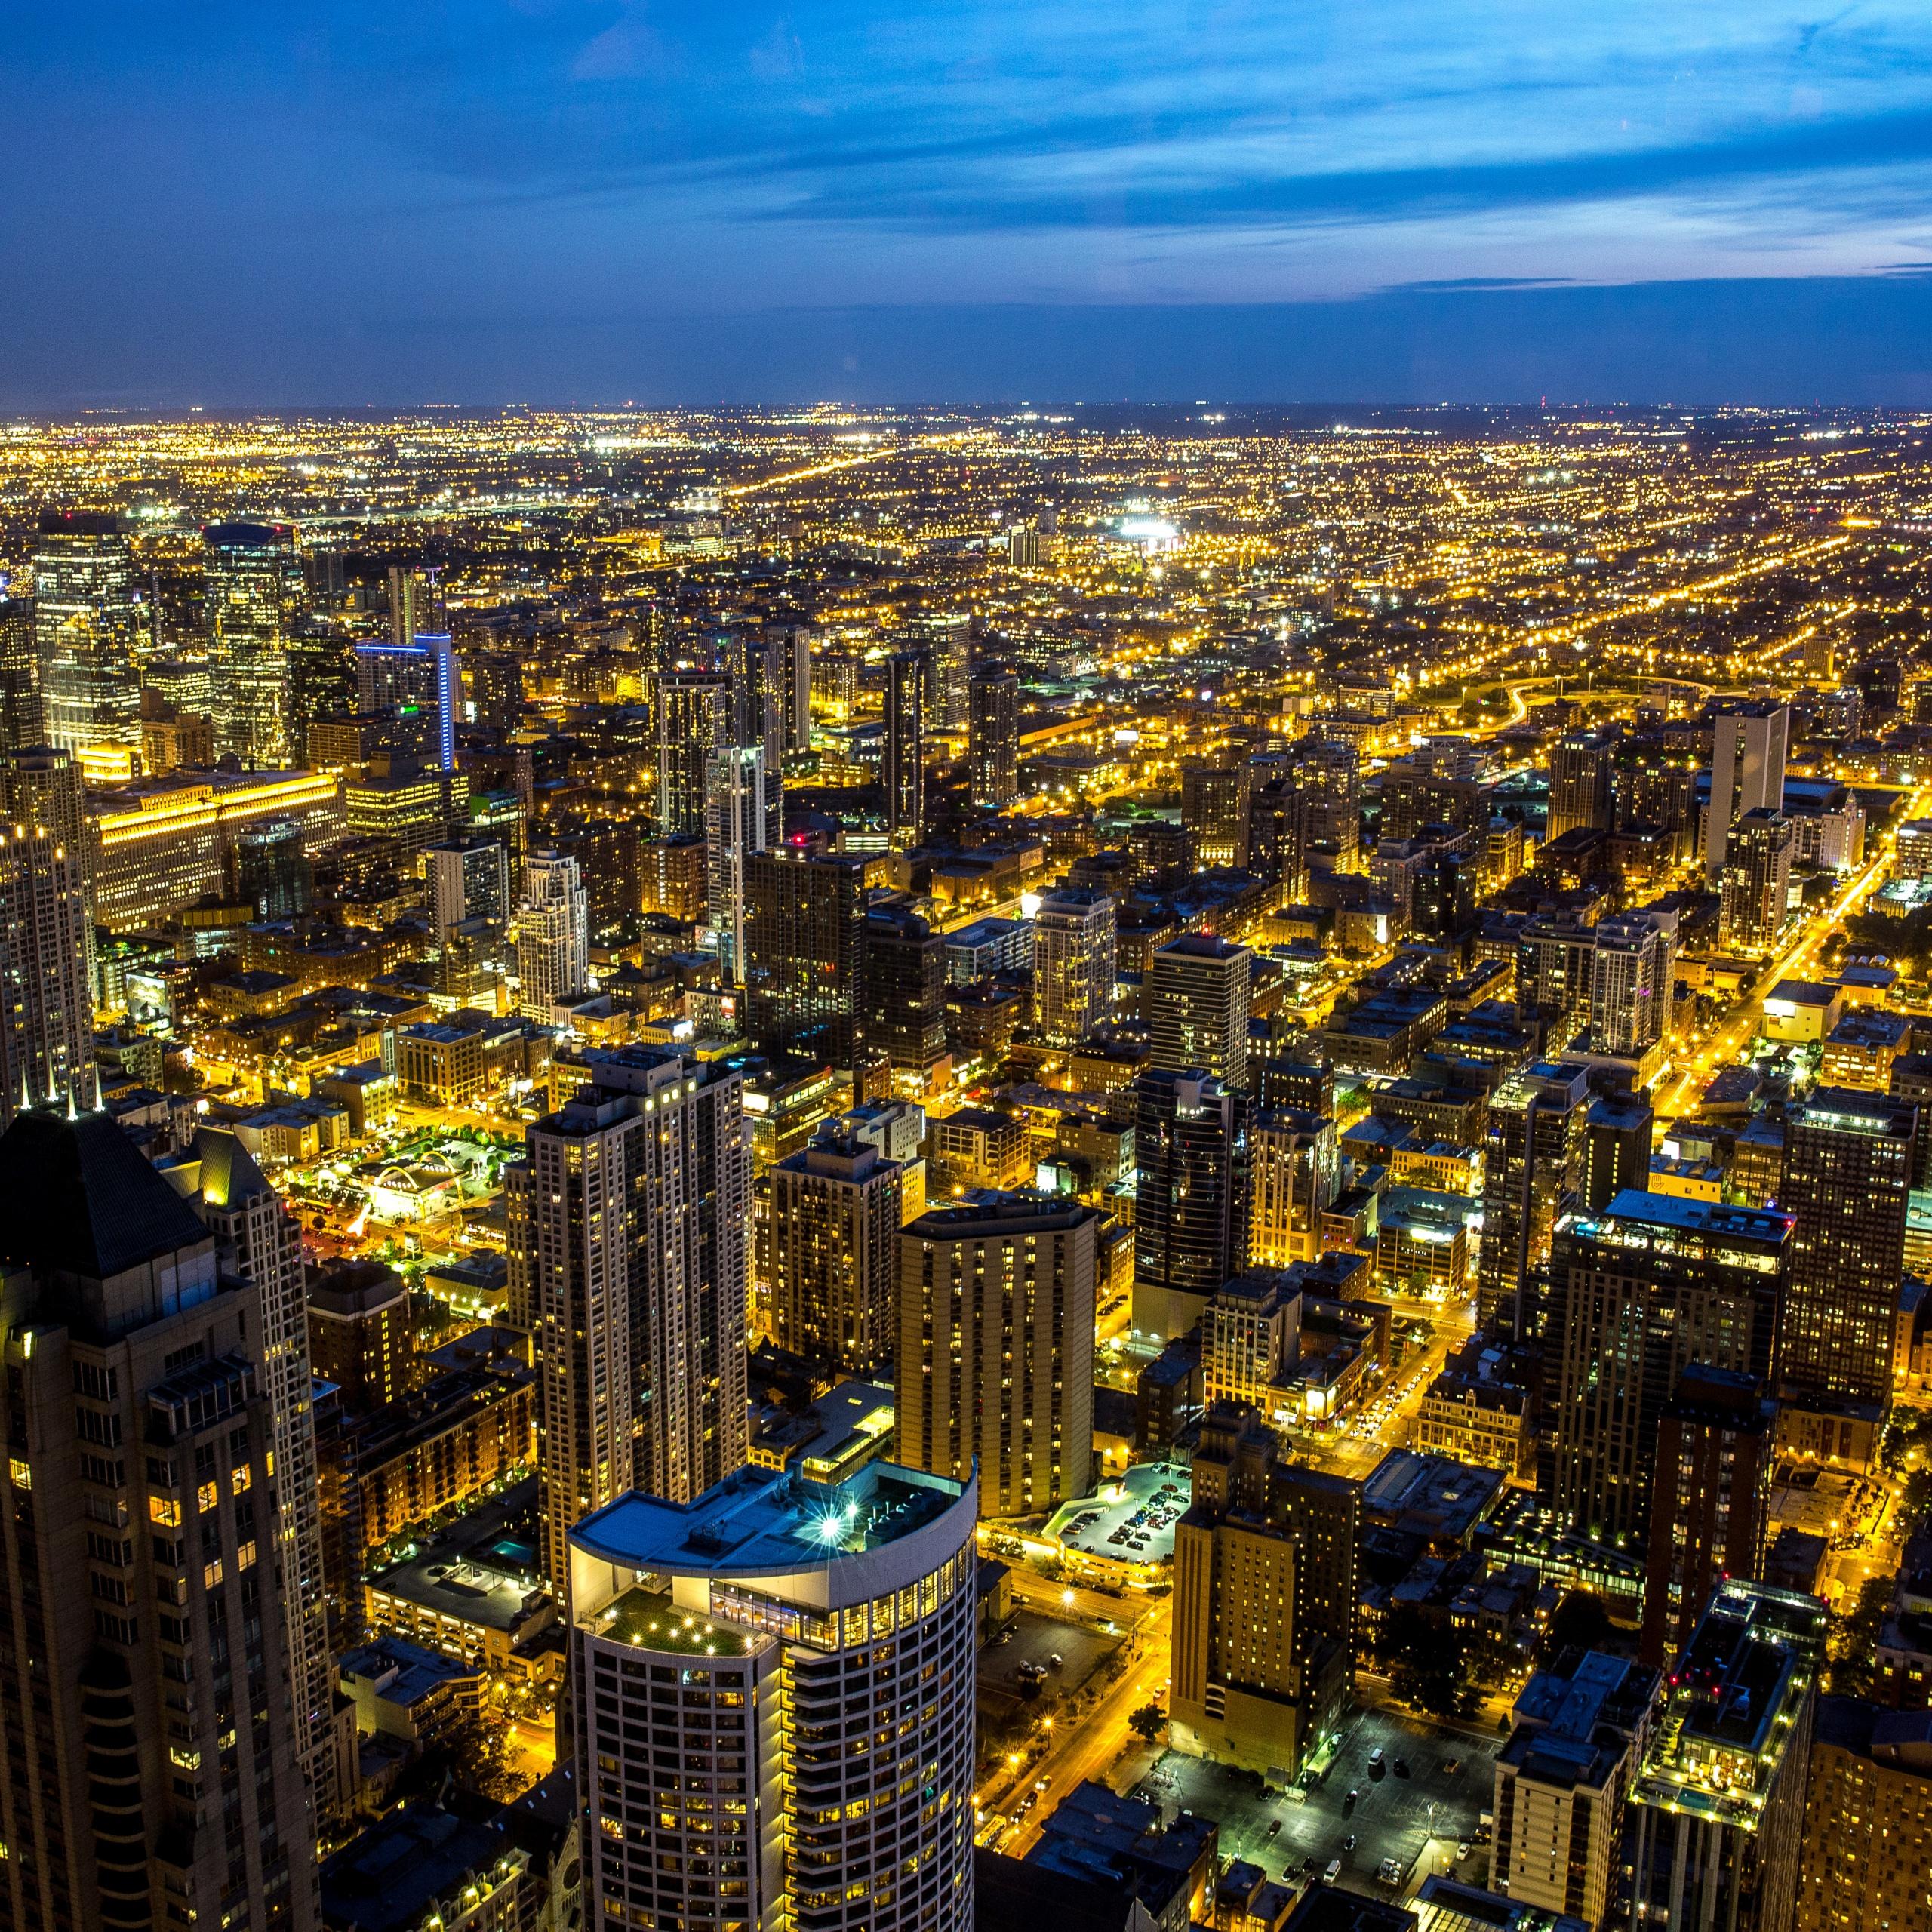 Chicago 4k Wallpaper Illinois City Skyline Night Cityscape Blue Sky Night Lights Photography 2458